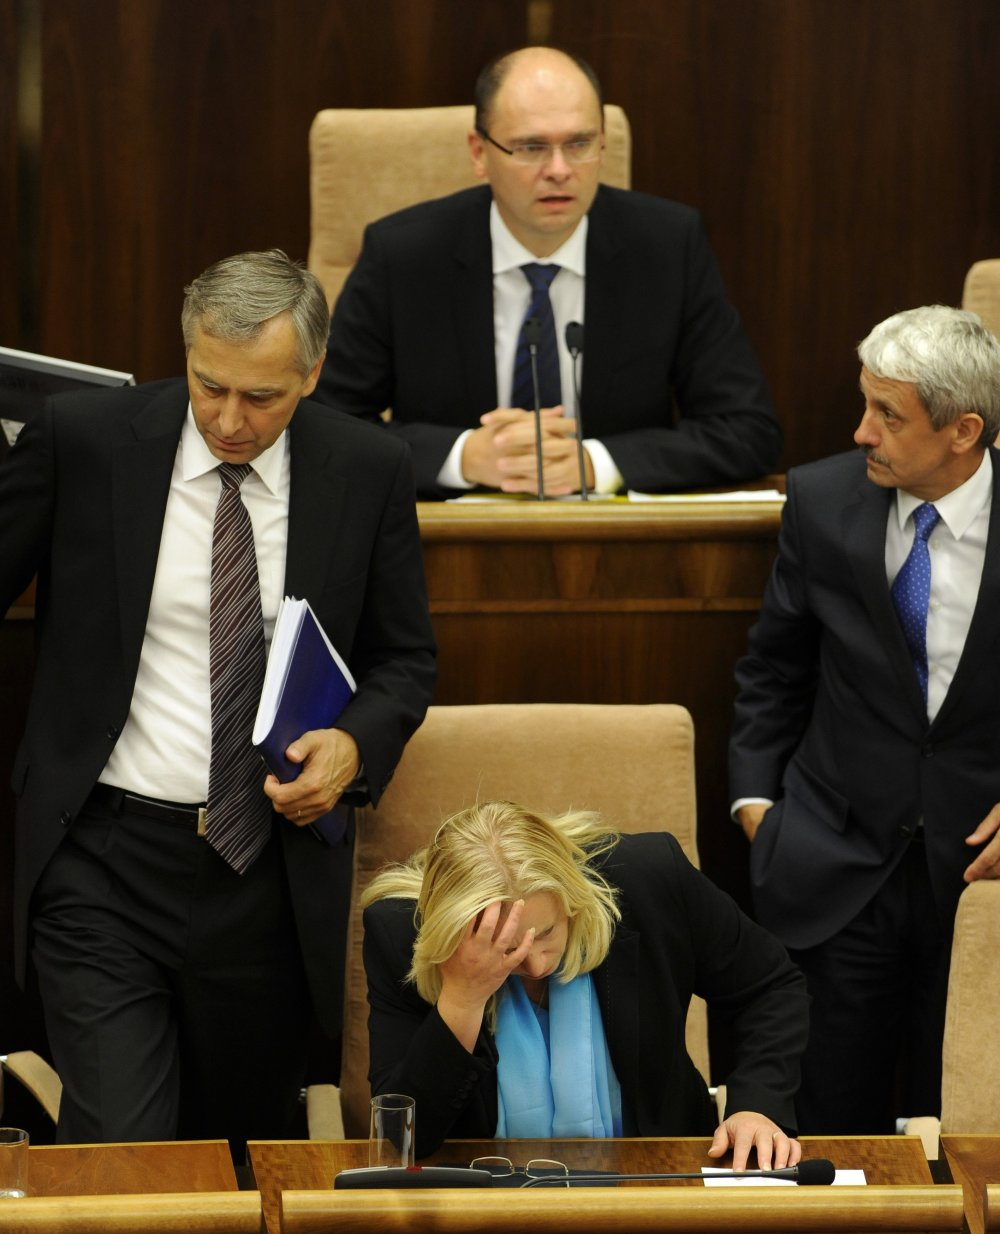 Práve padla vláda. Hlavní aktéri: Iveta Radičová, Richard Sulík a Mikuláš Dzurinda. Foto - TASR